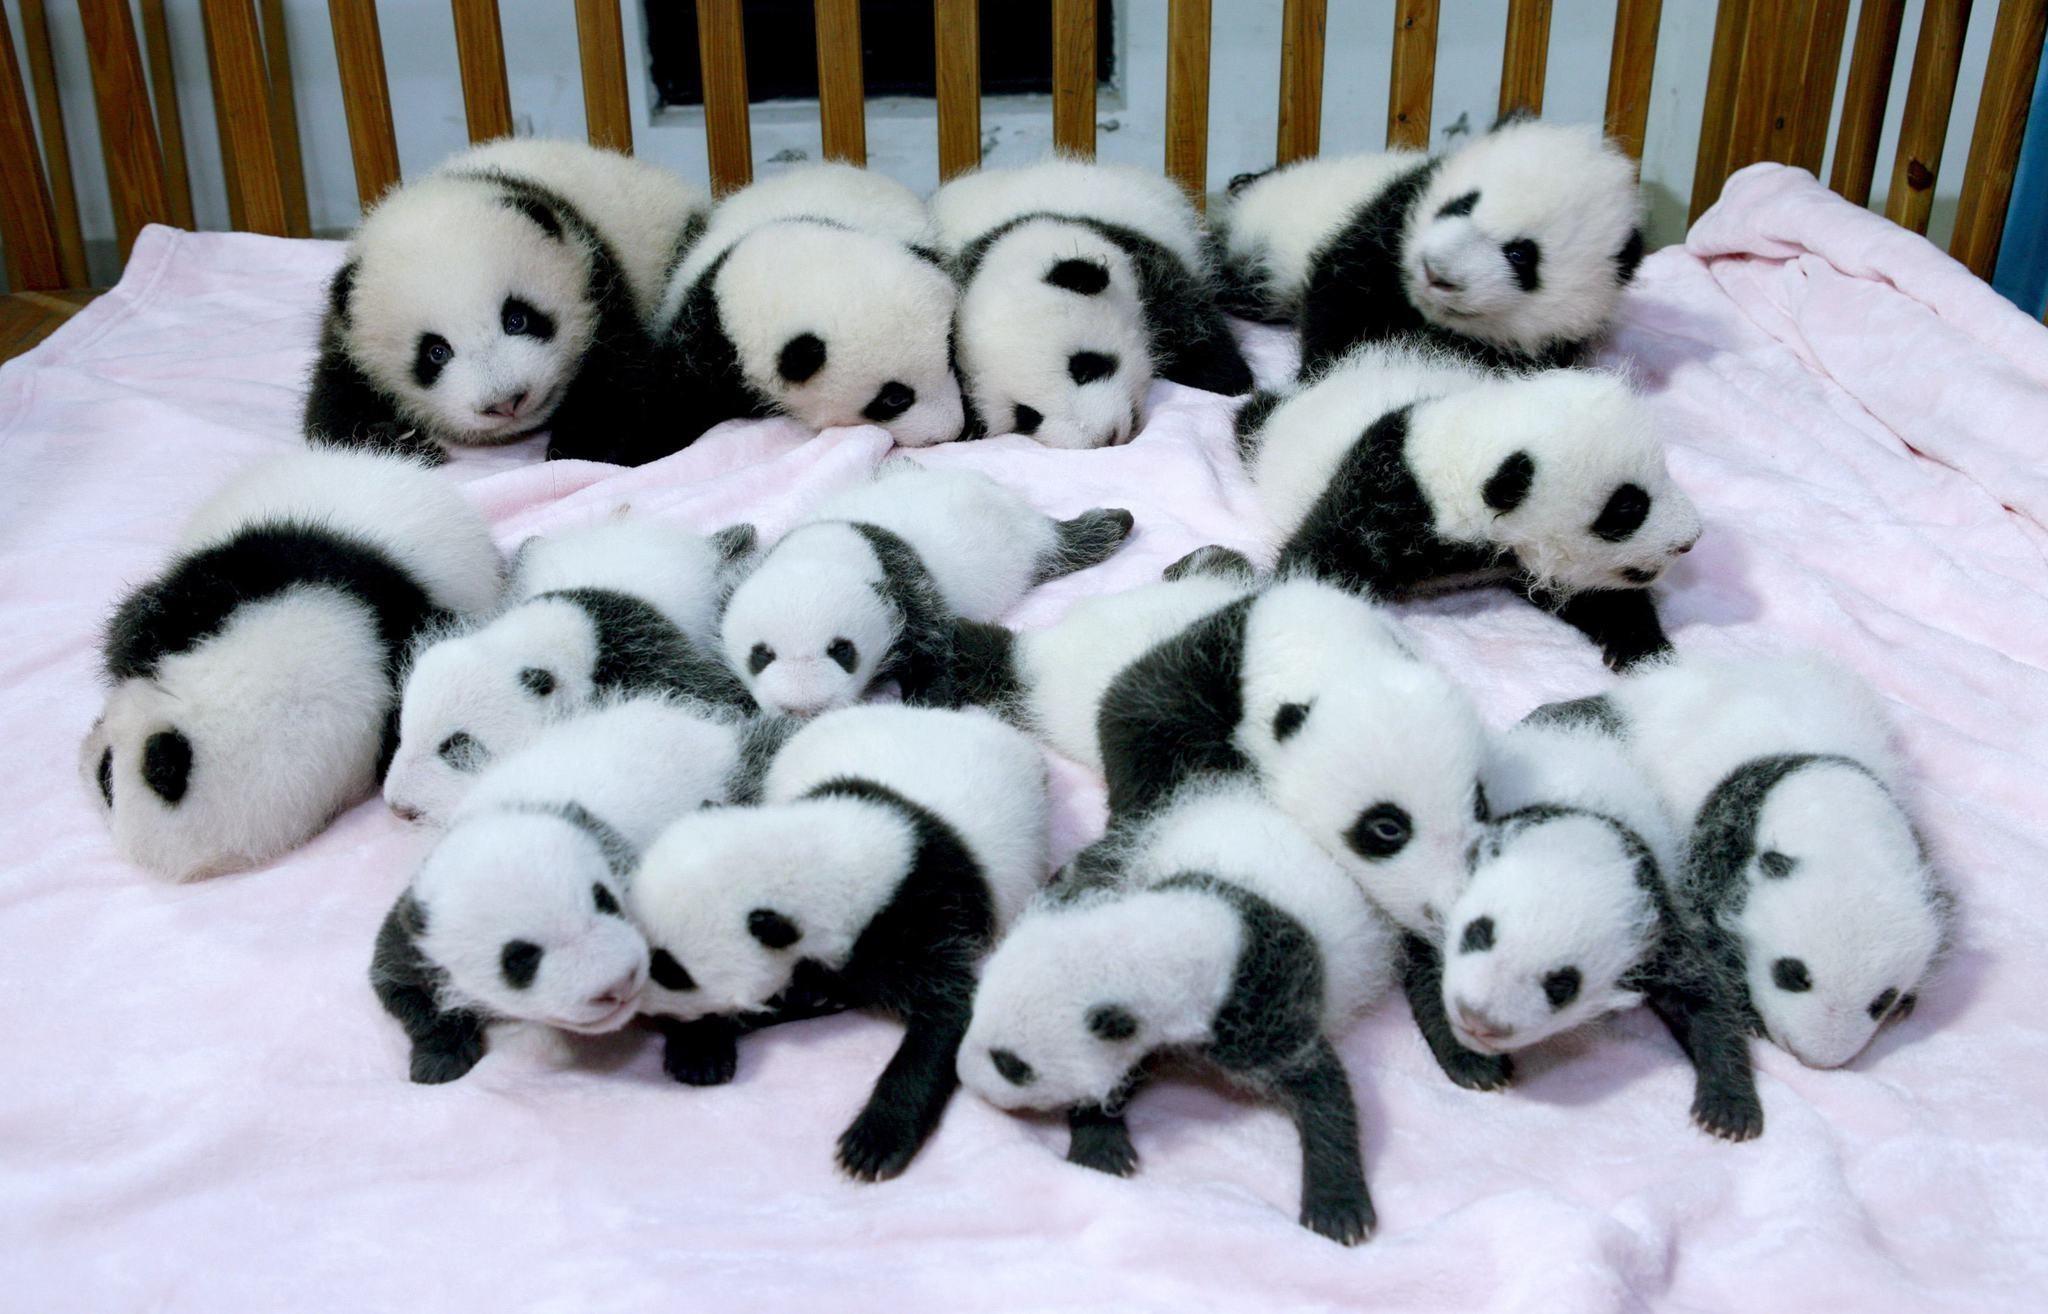 Panda Pandas Baer Bears Baby Cute Photo Download >